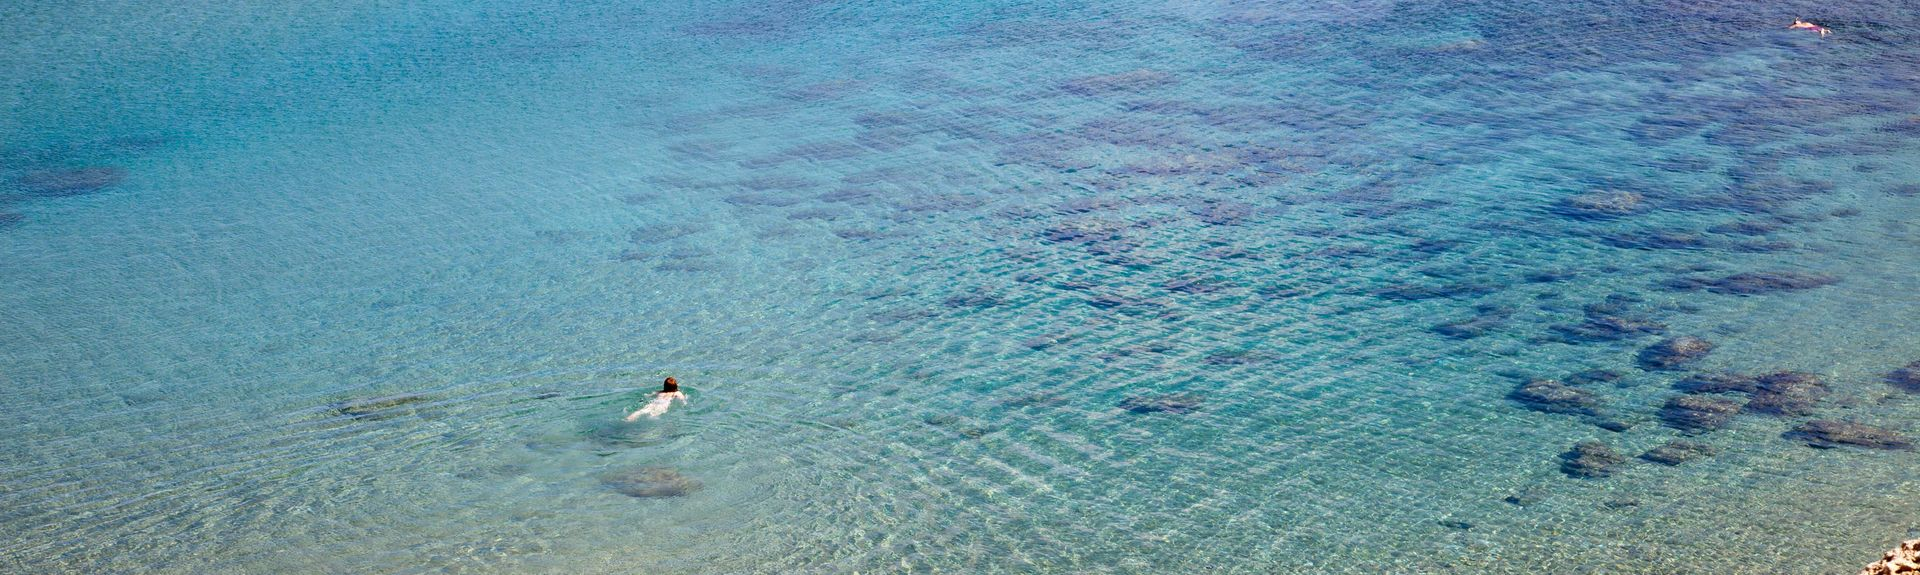 Avgorou, Cyprus